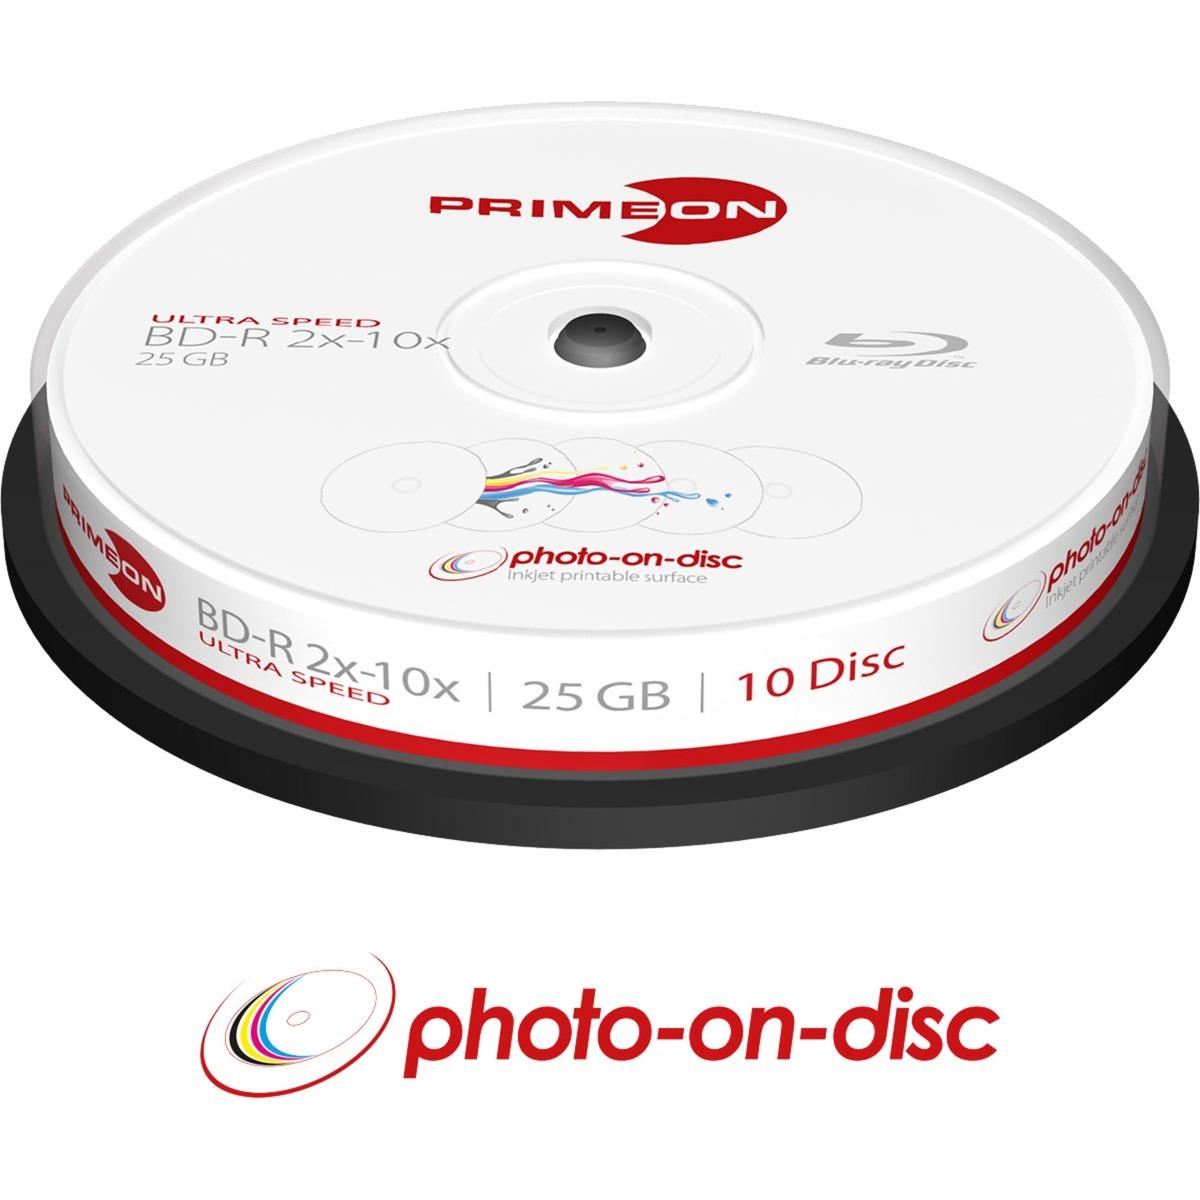 2761309-25gb-bd-r-readwrite-blu-ray-medie-bd-blu-ray-diske